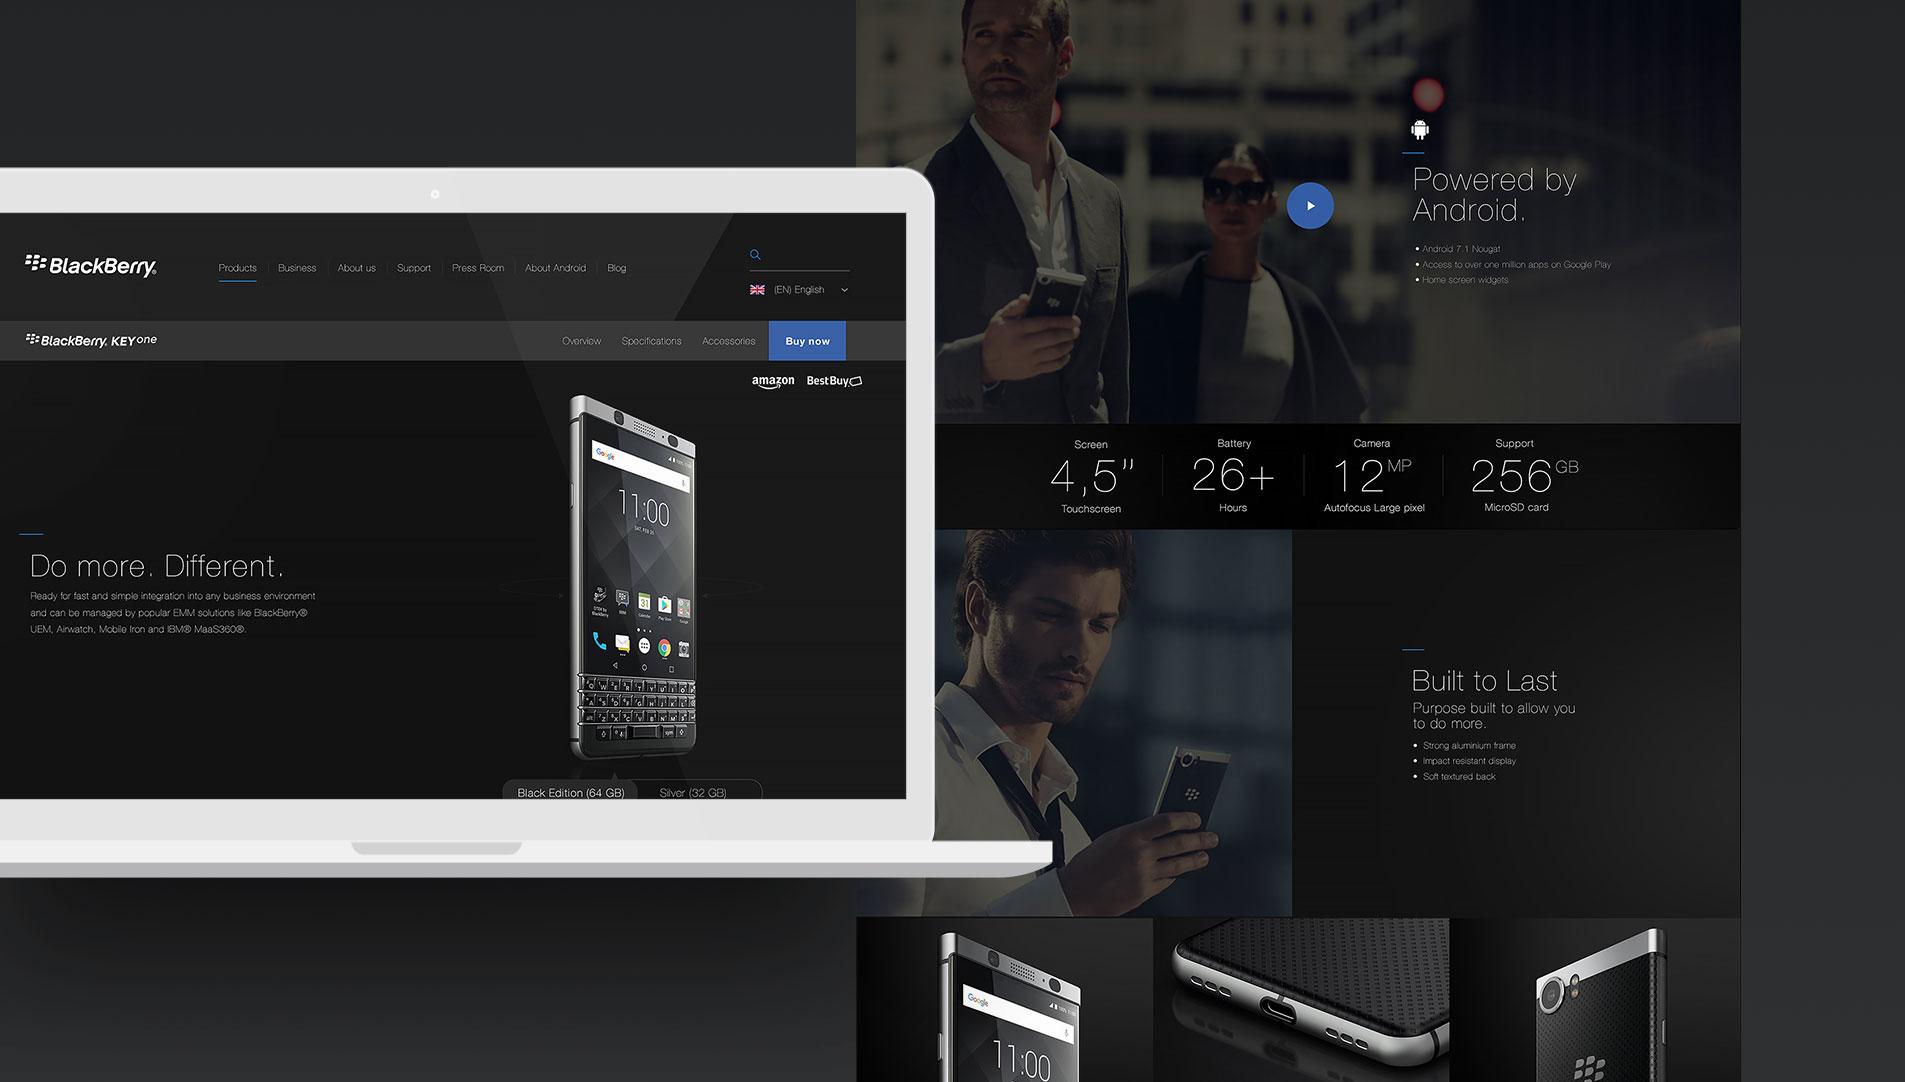 web design hong kong BlackBerry slideshow 02